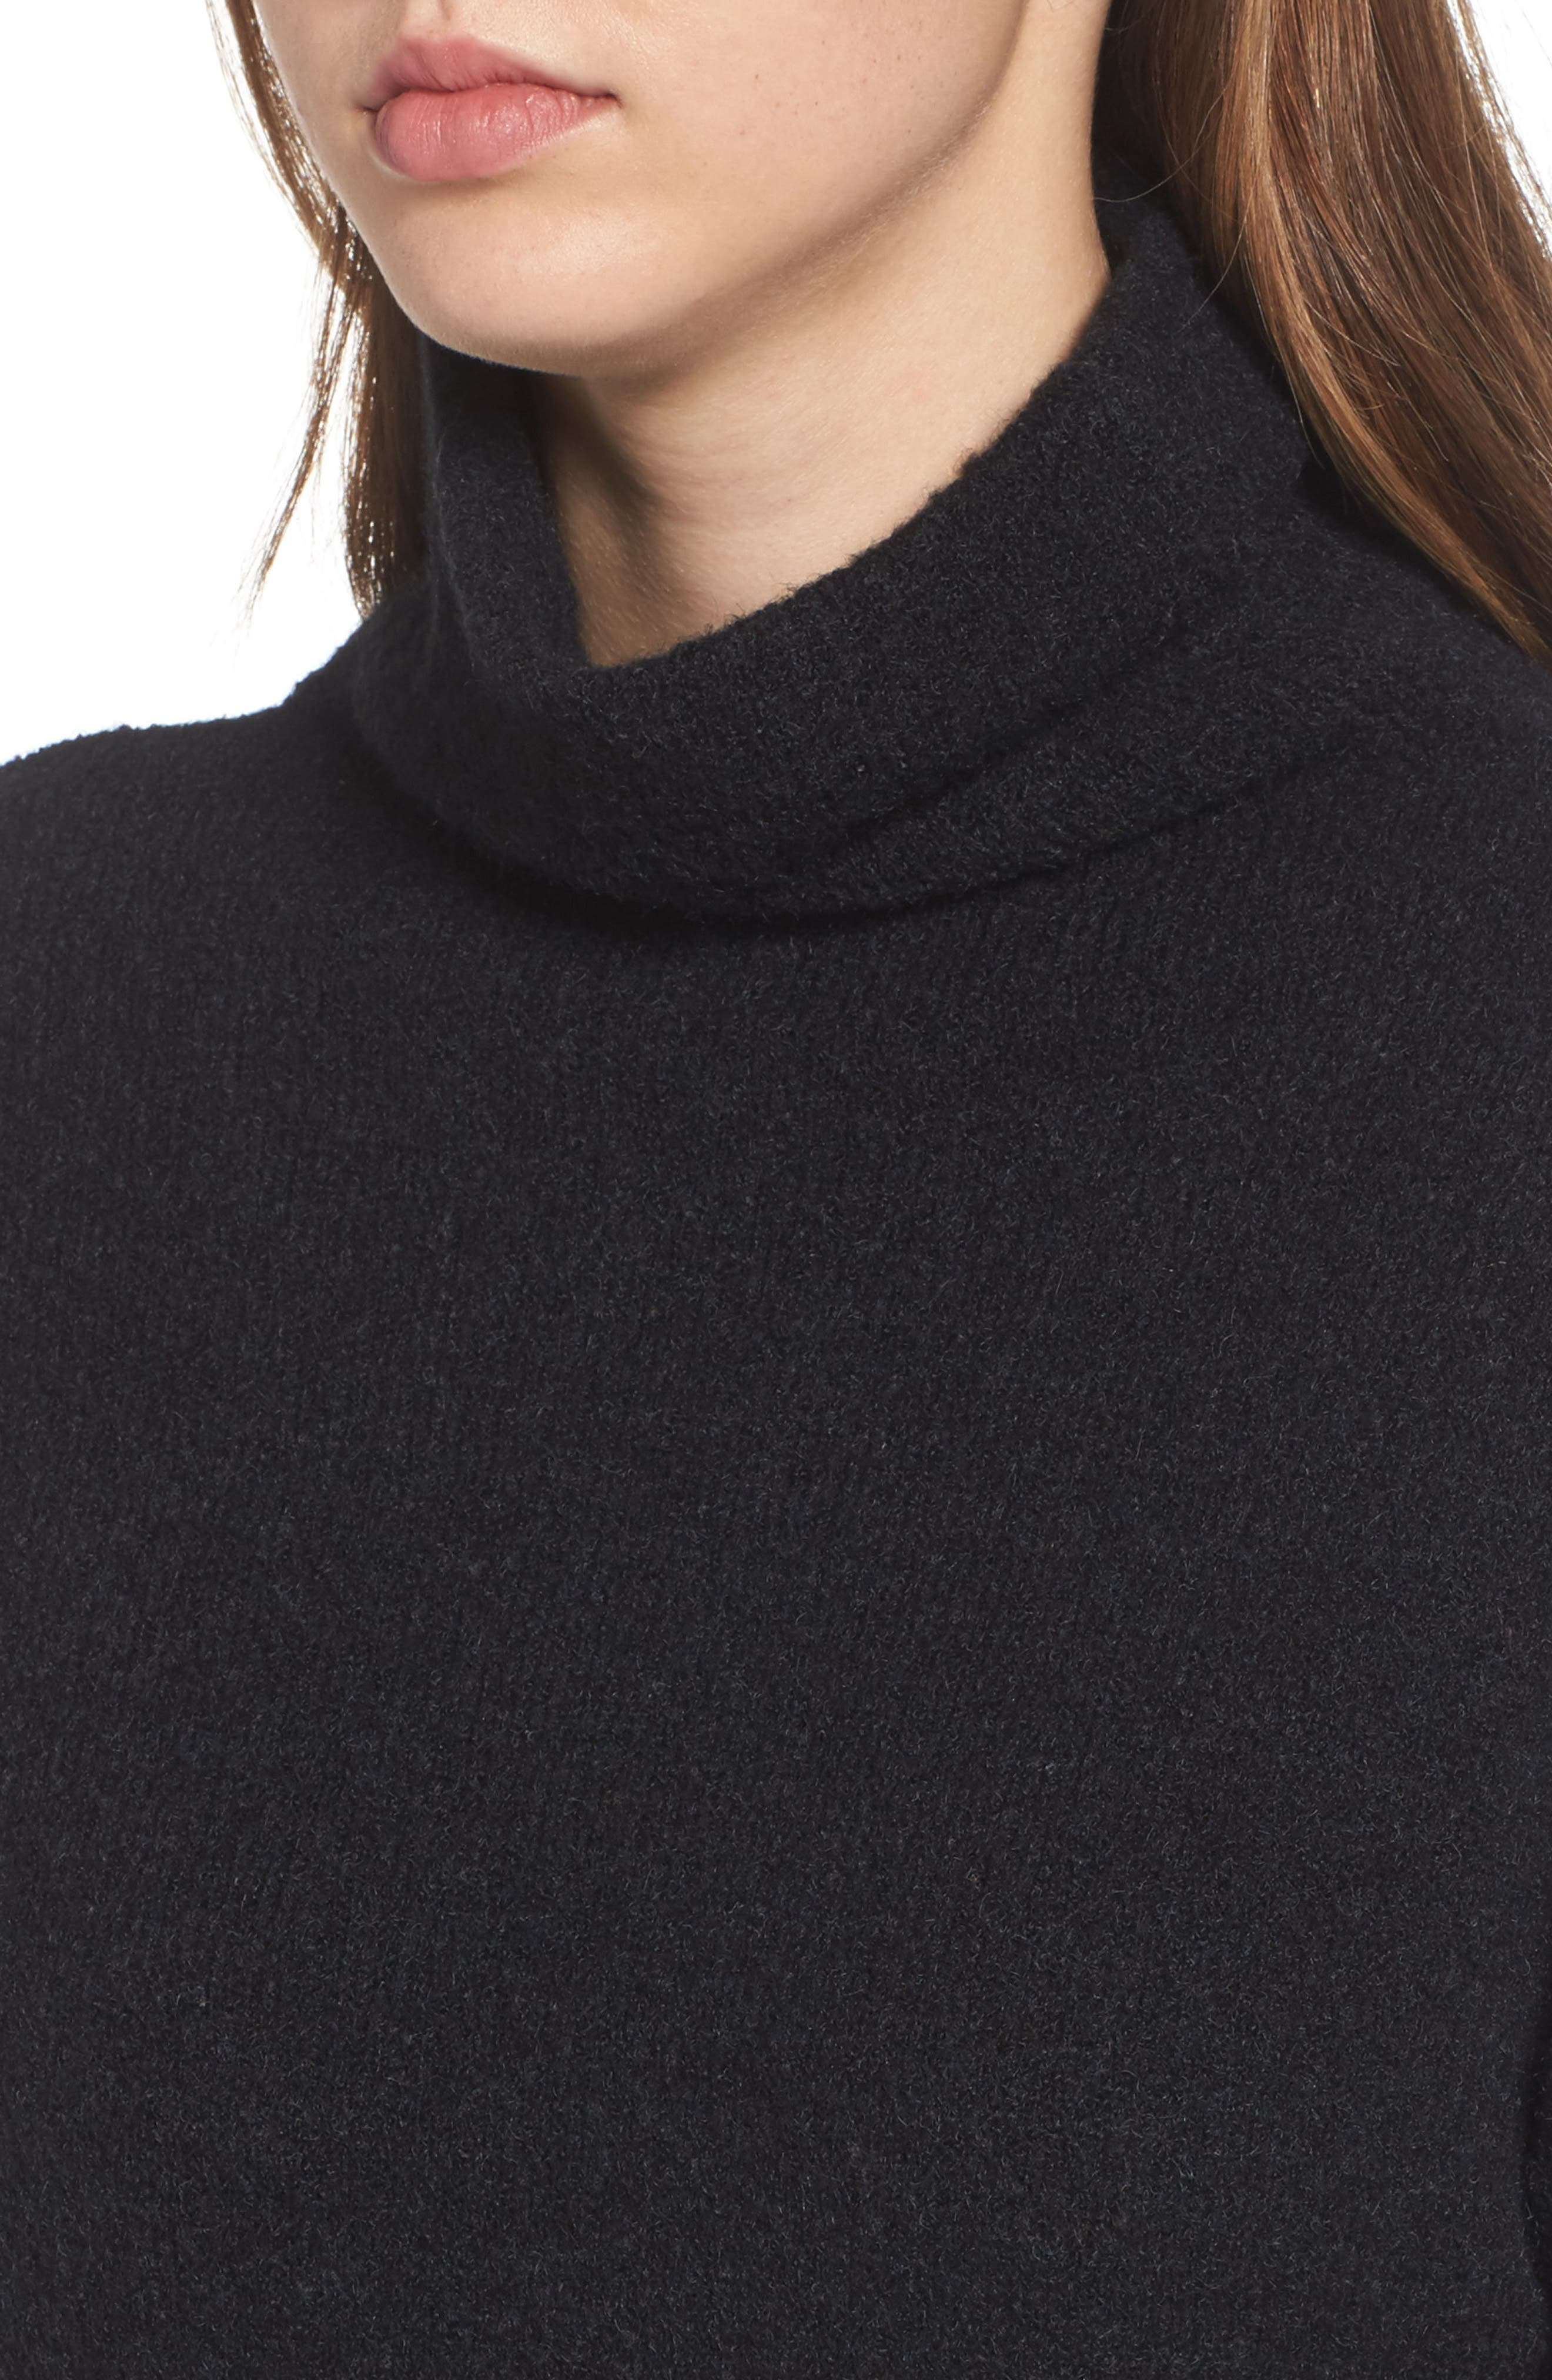 Bouclé Turtleneck Tunic Sweater,                             Alternate thumbnail 4, color,                             001